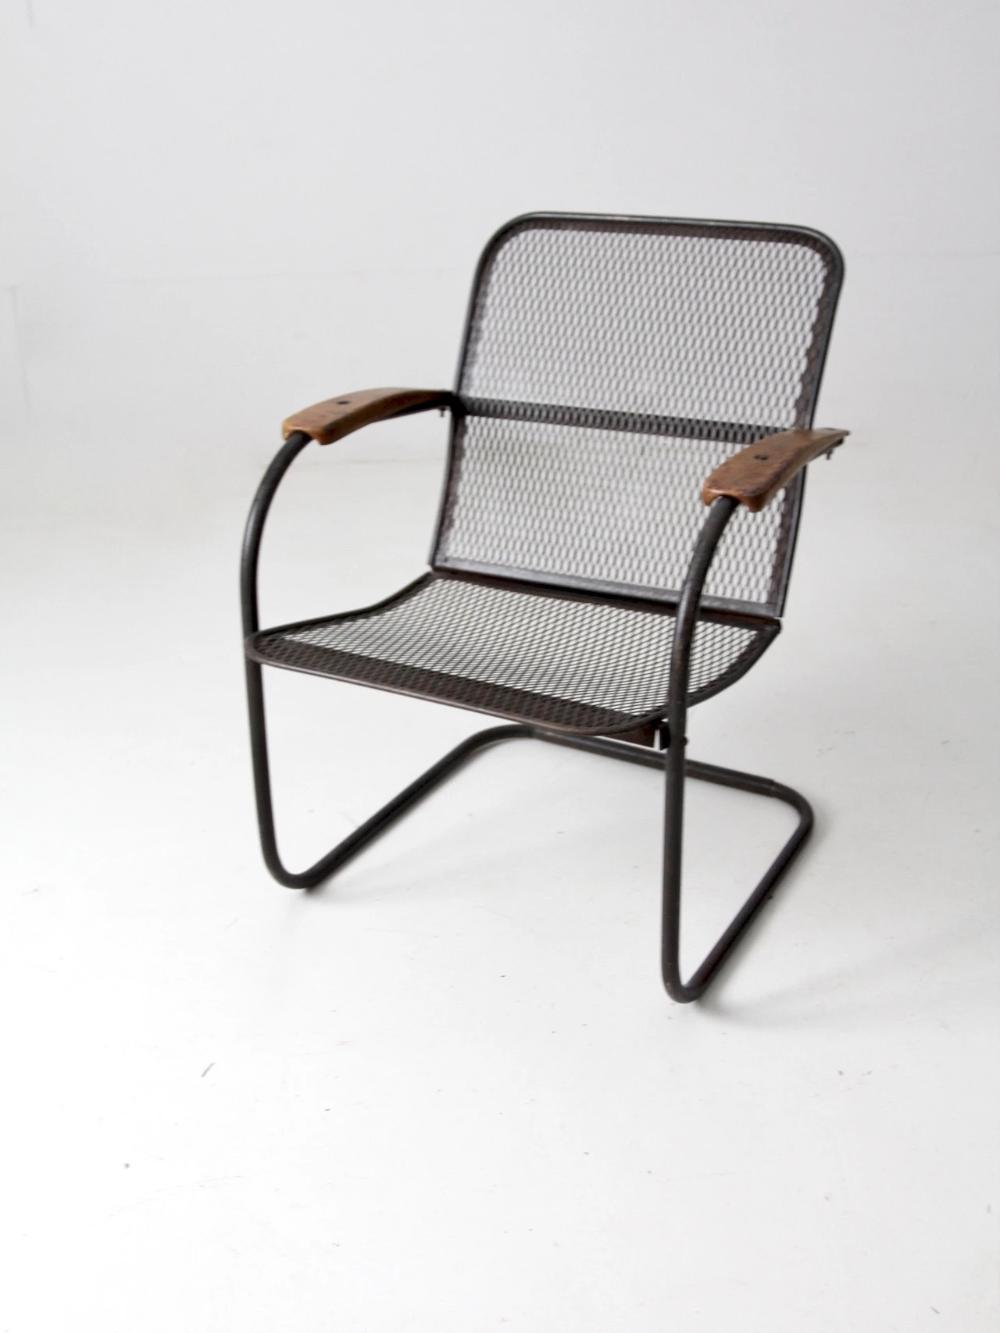 Download Wallpaper Vintage Expanded Metal Patio Furniture